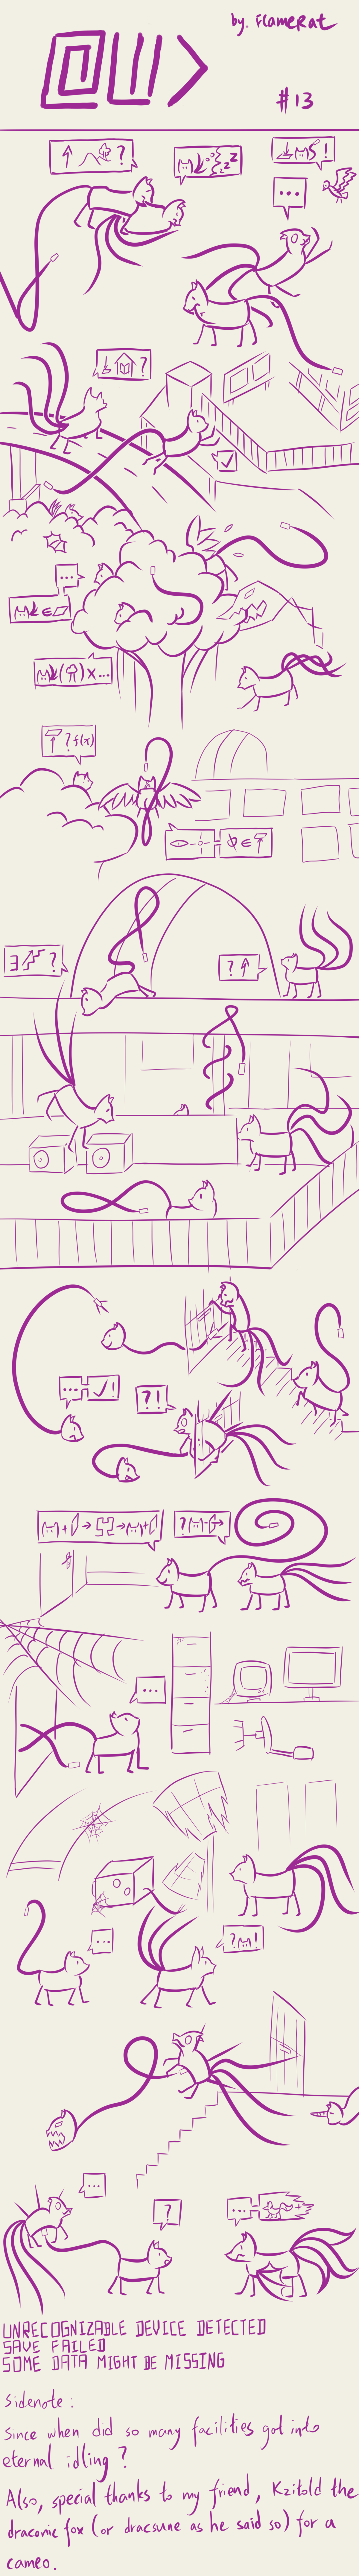 [Comic] At Wild Do #13 by FlameRat-YehLon